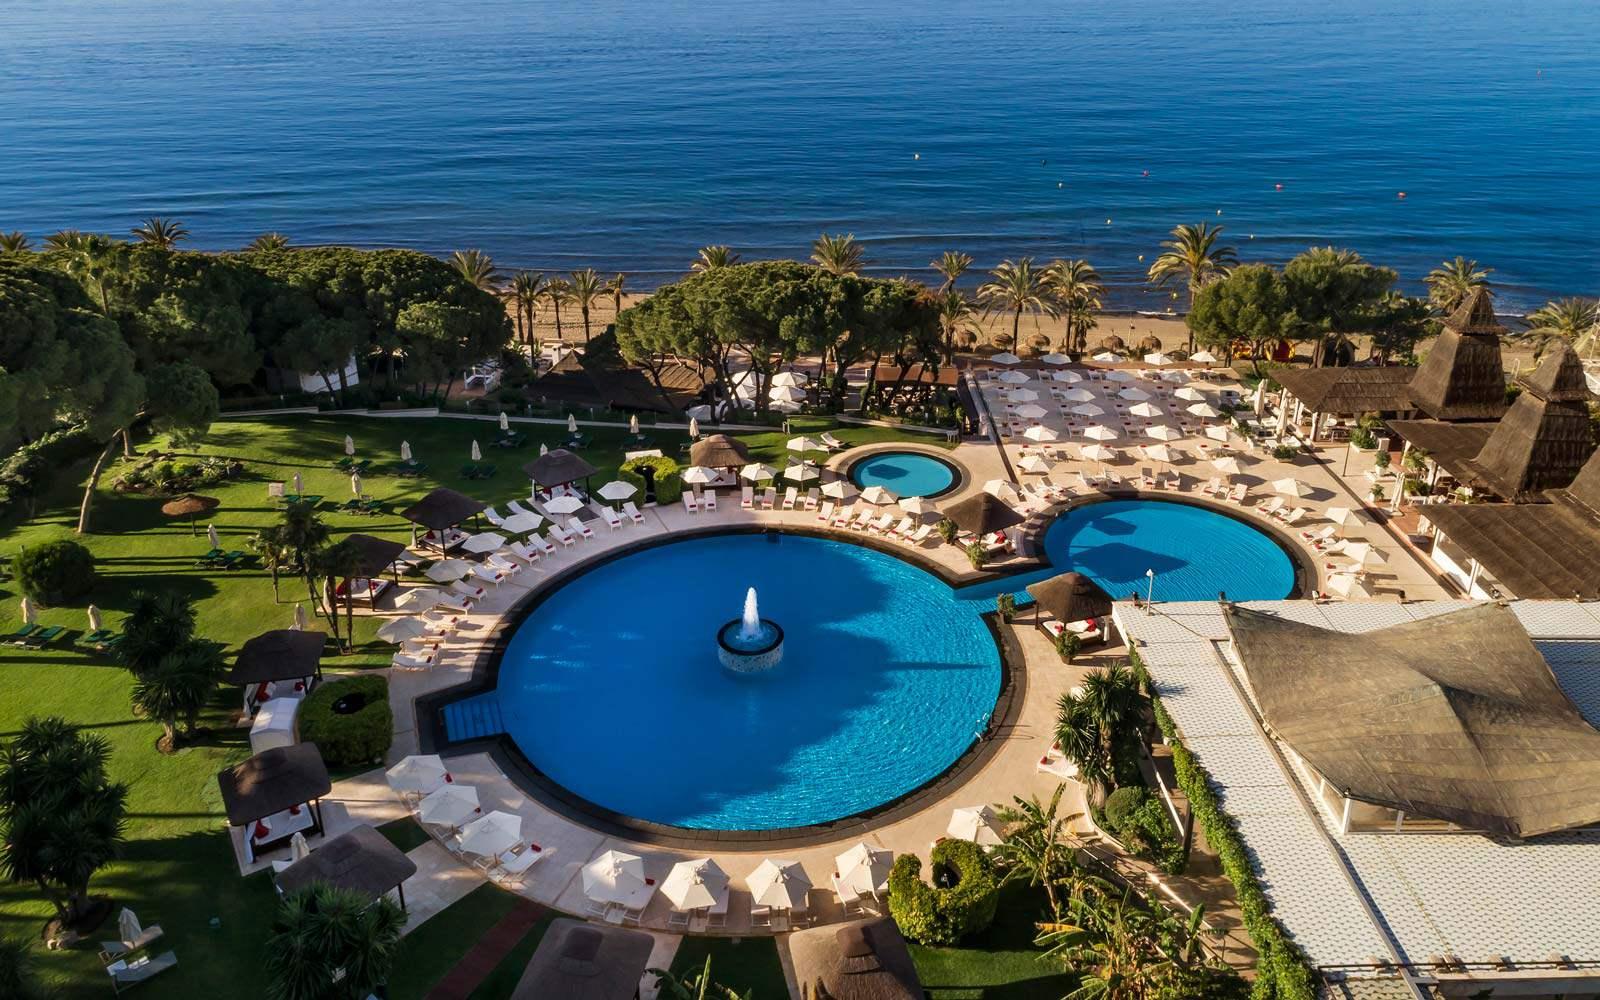 Hotel Gran Melia Don Pepe